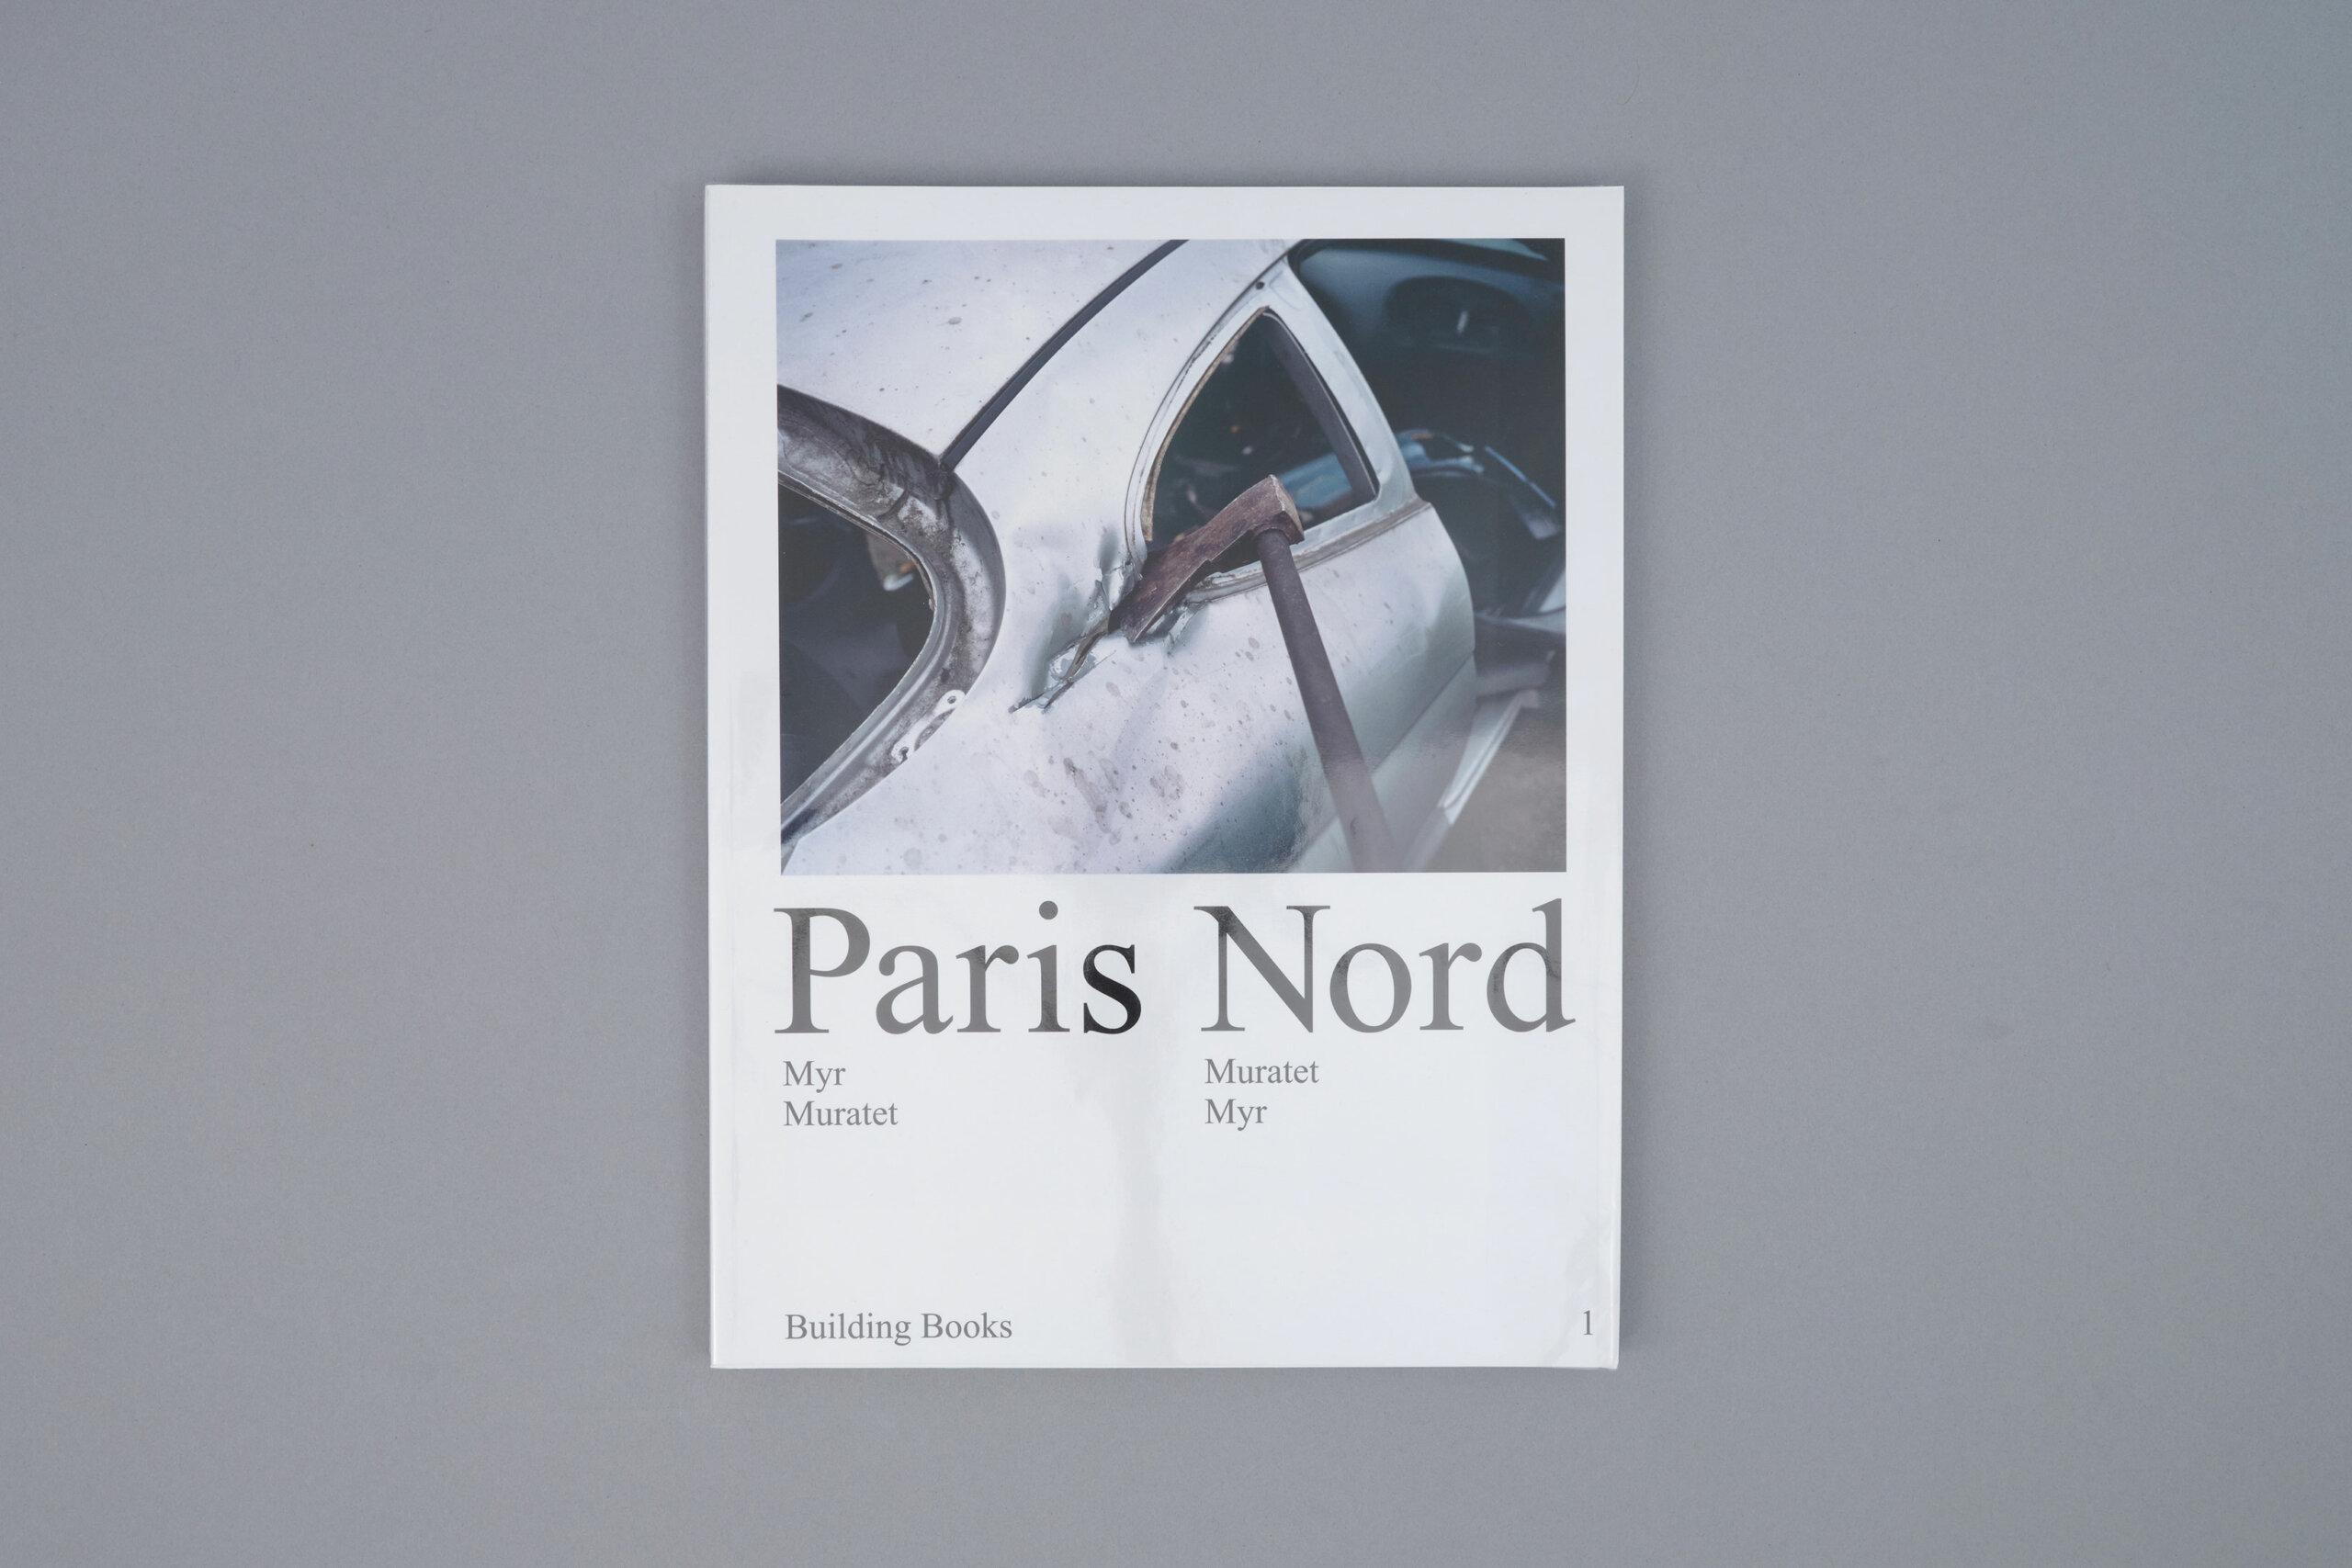 paris-nord-myr-muratet-delpire-1